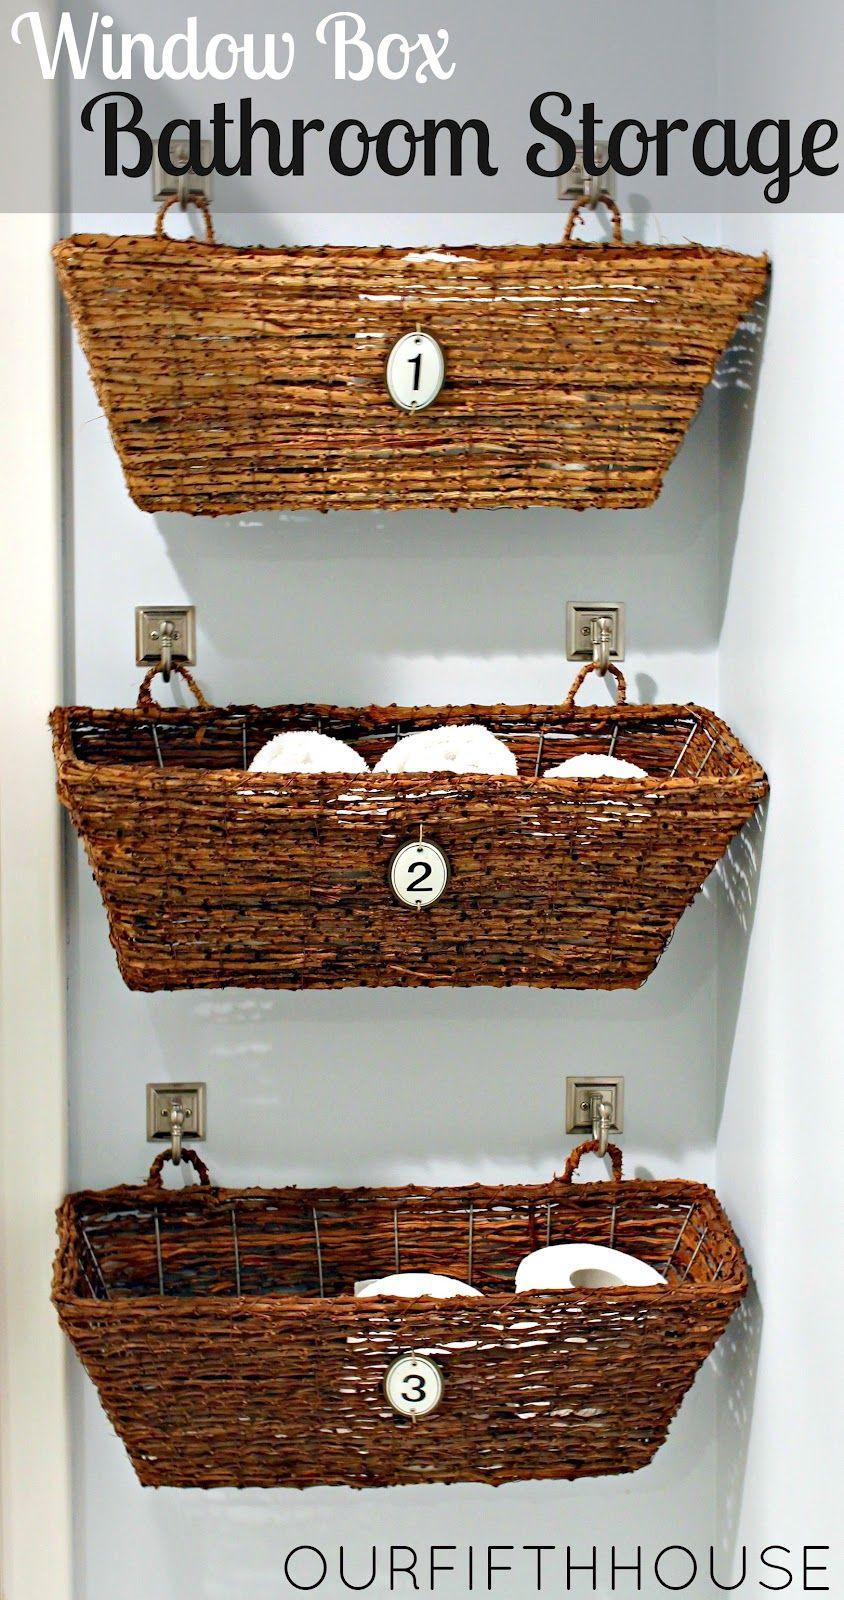 Window Box Bathroom Storage Perfect For A Small Bathroom regarding measurements 844 X 1600